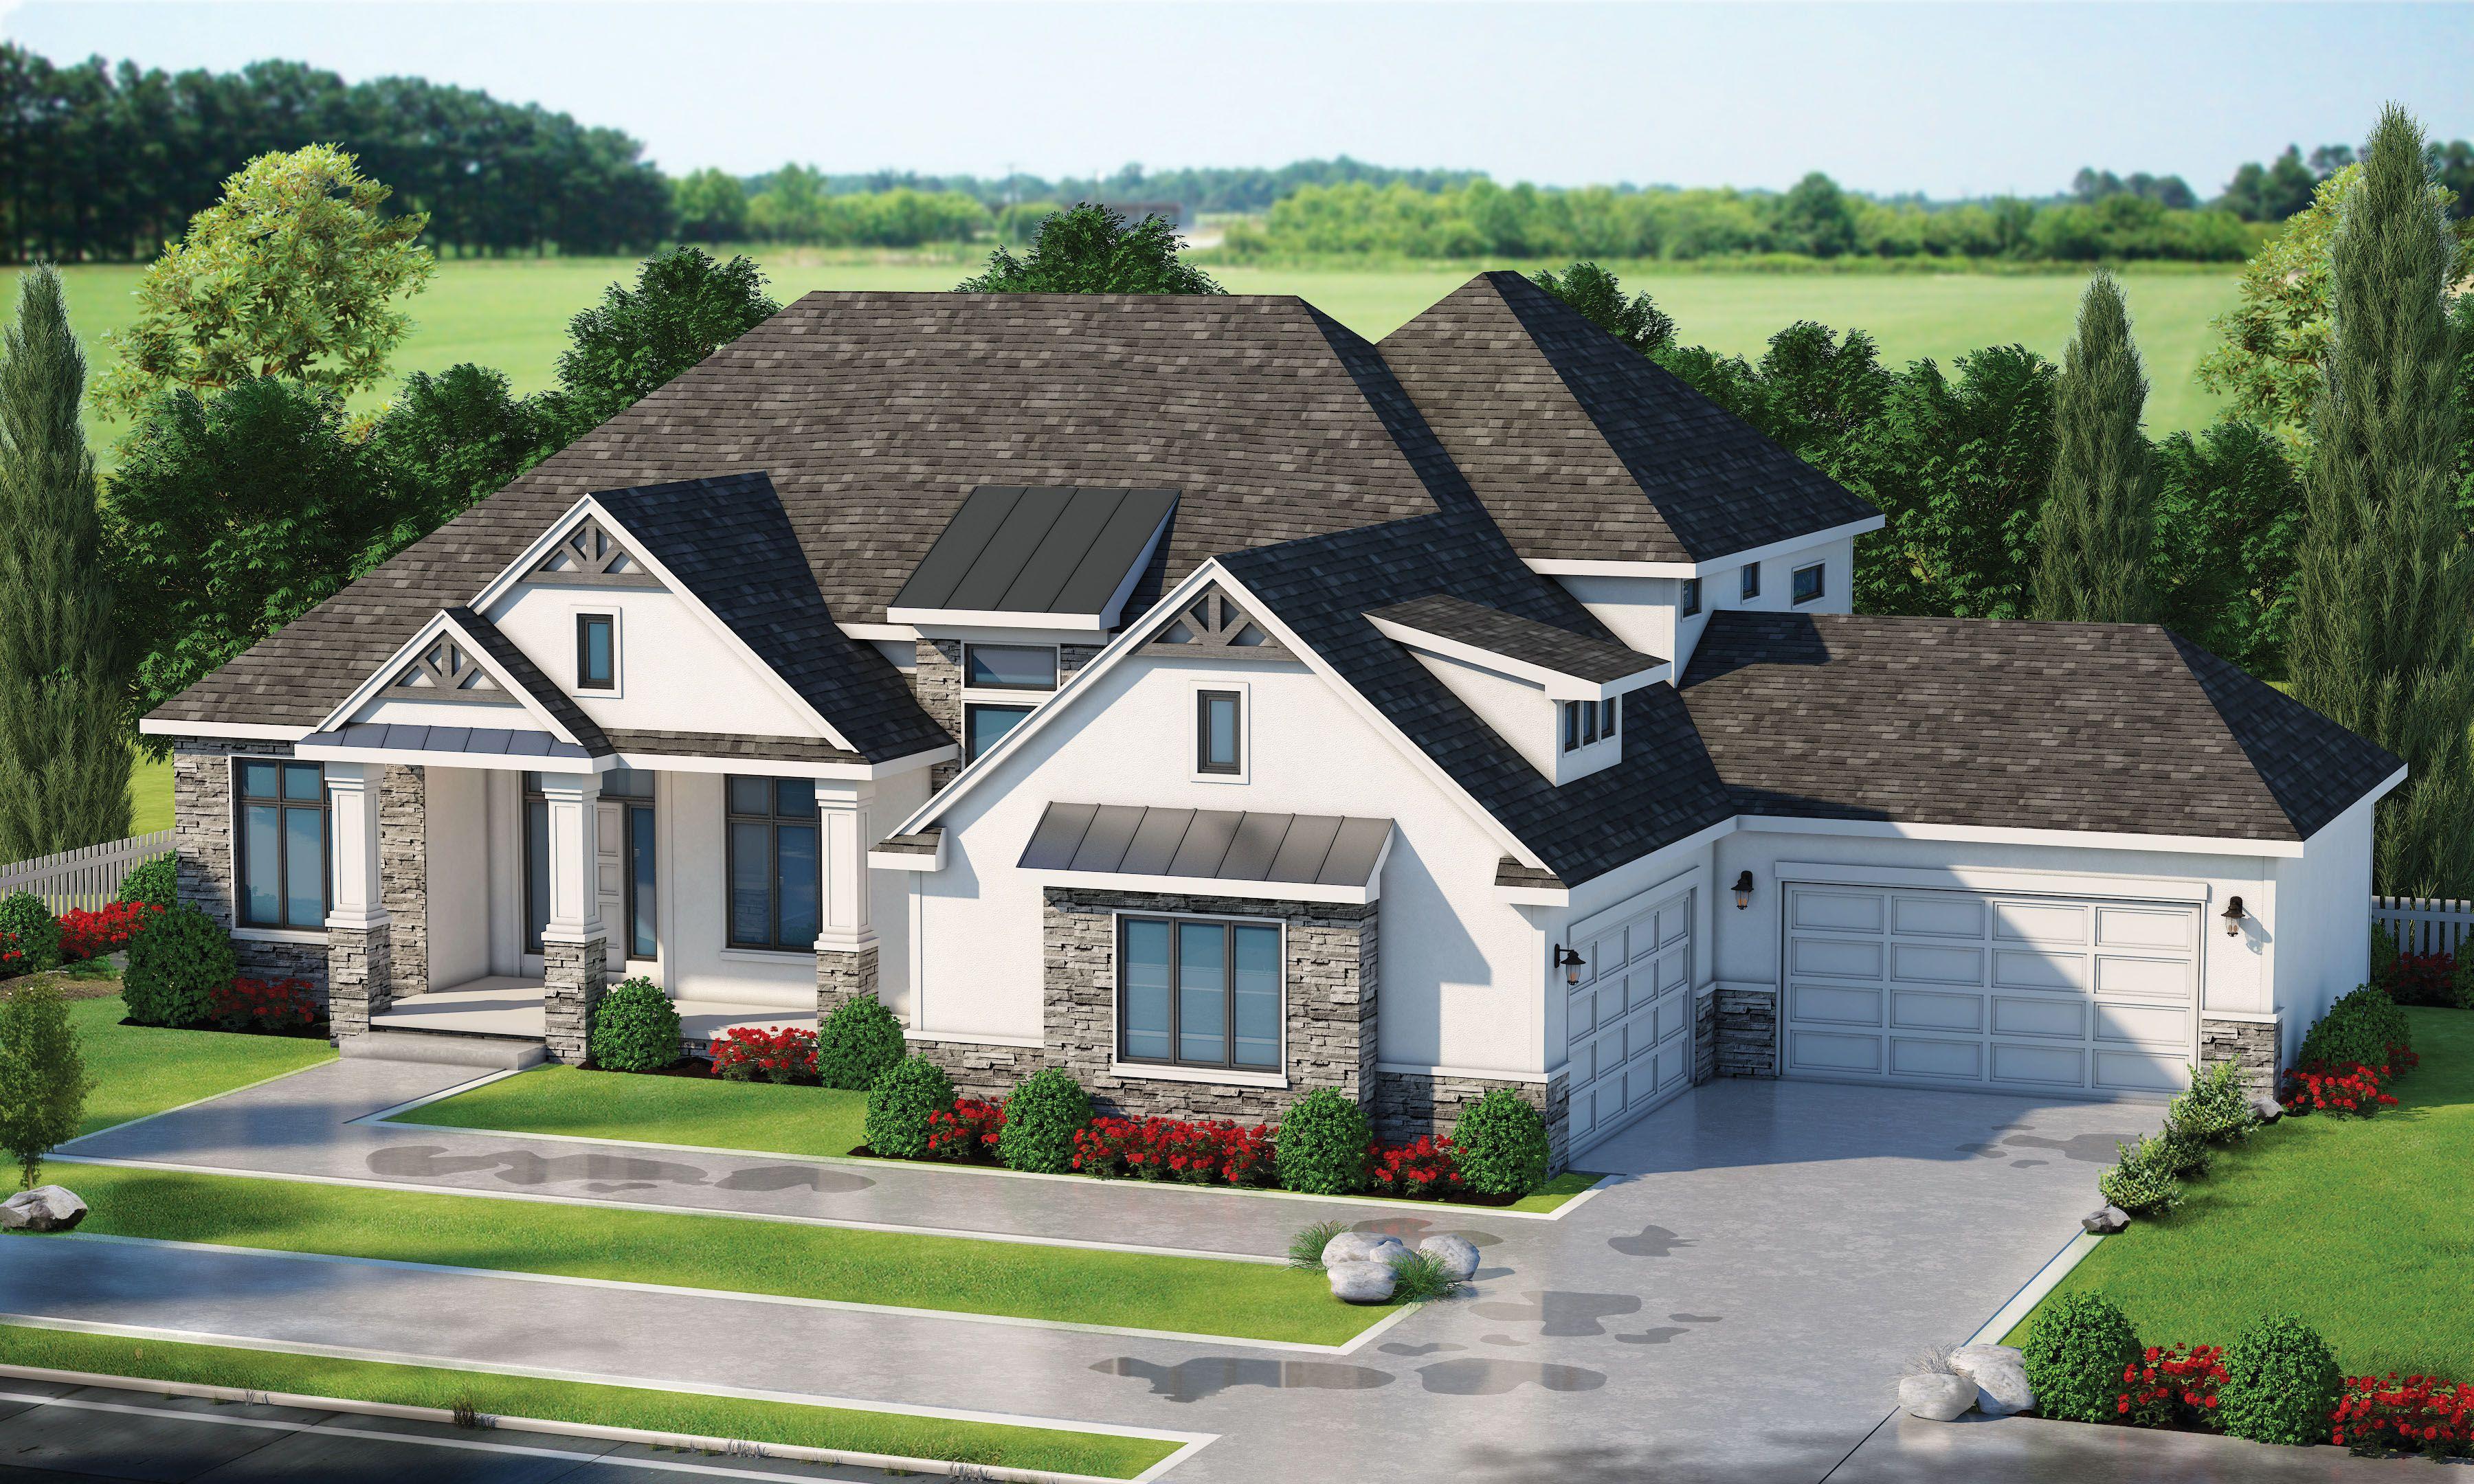 Plan View Design Basics Craftsman Style House Plans Craftsman House Stucco Homes